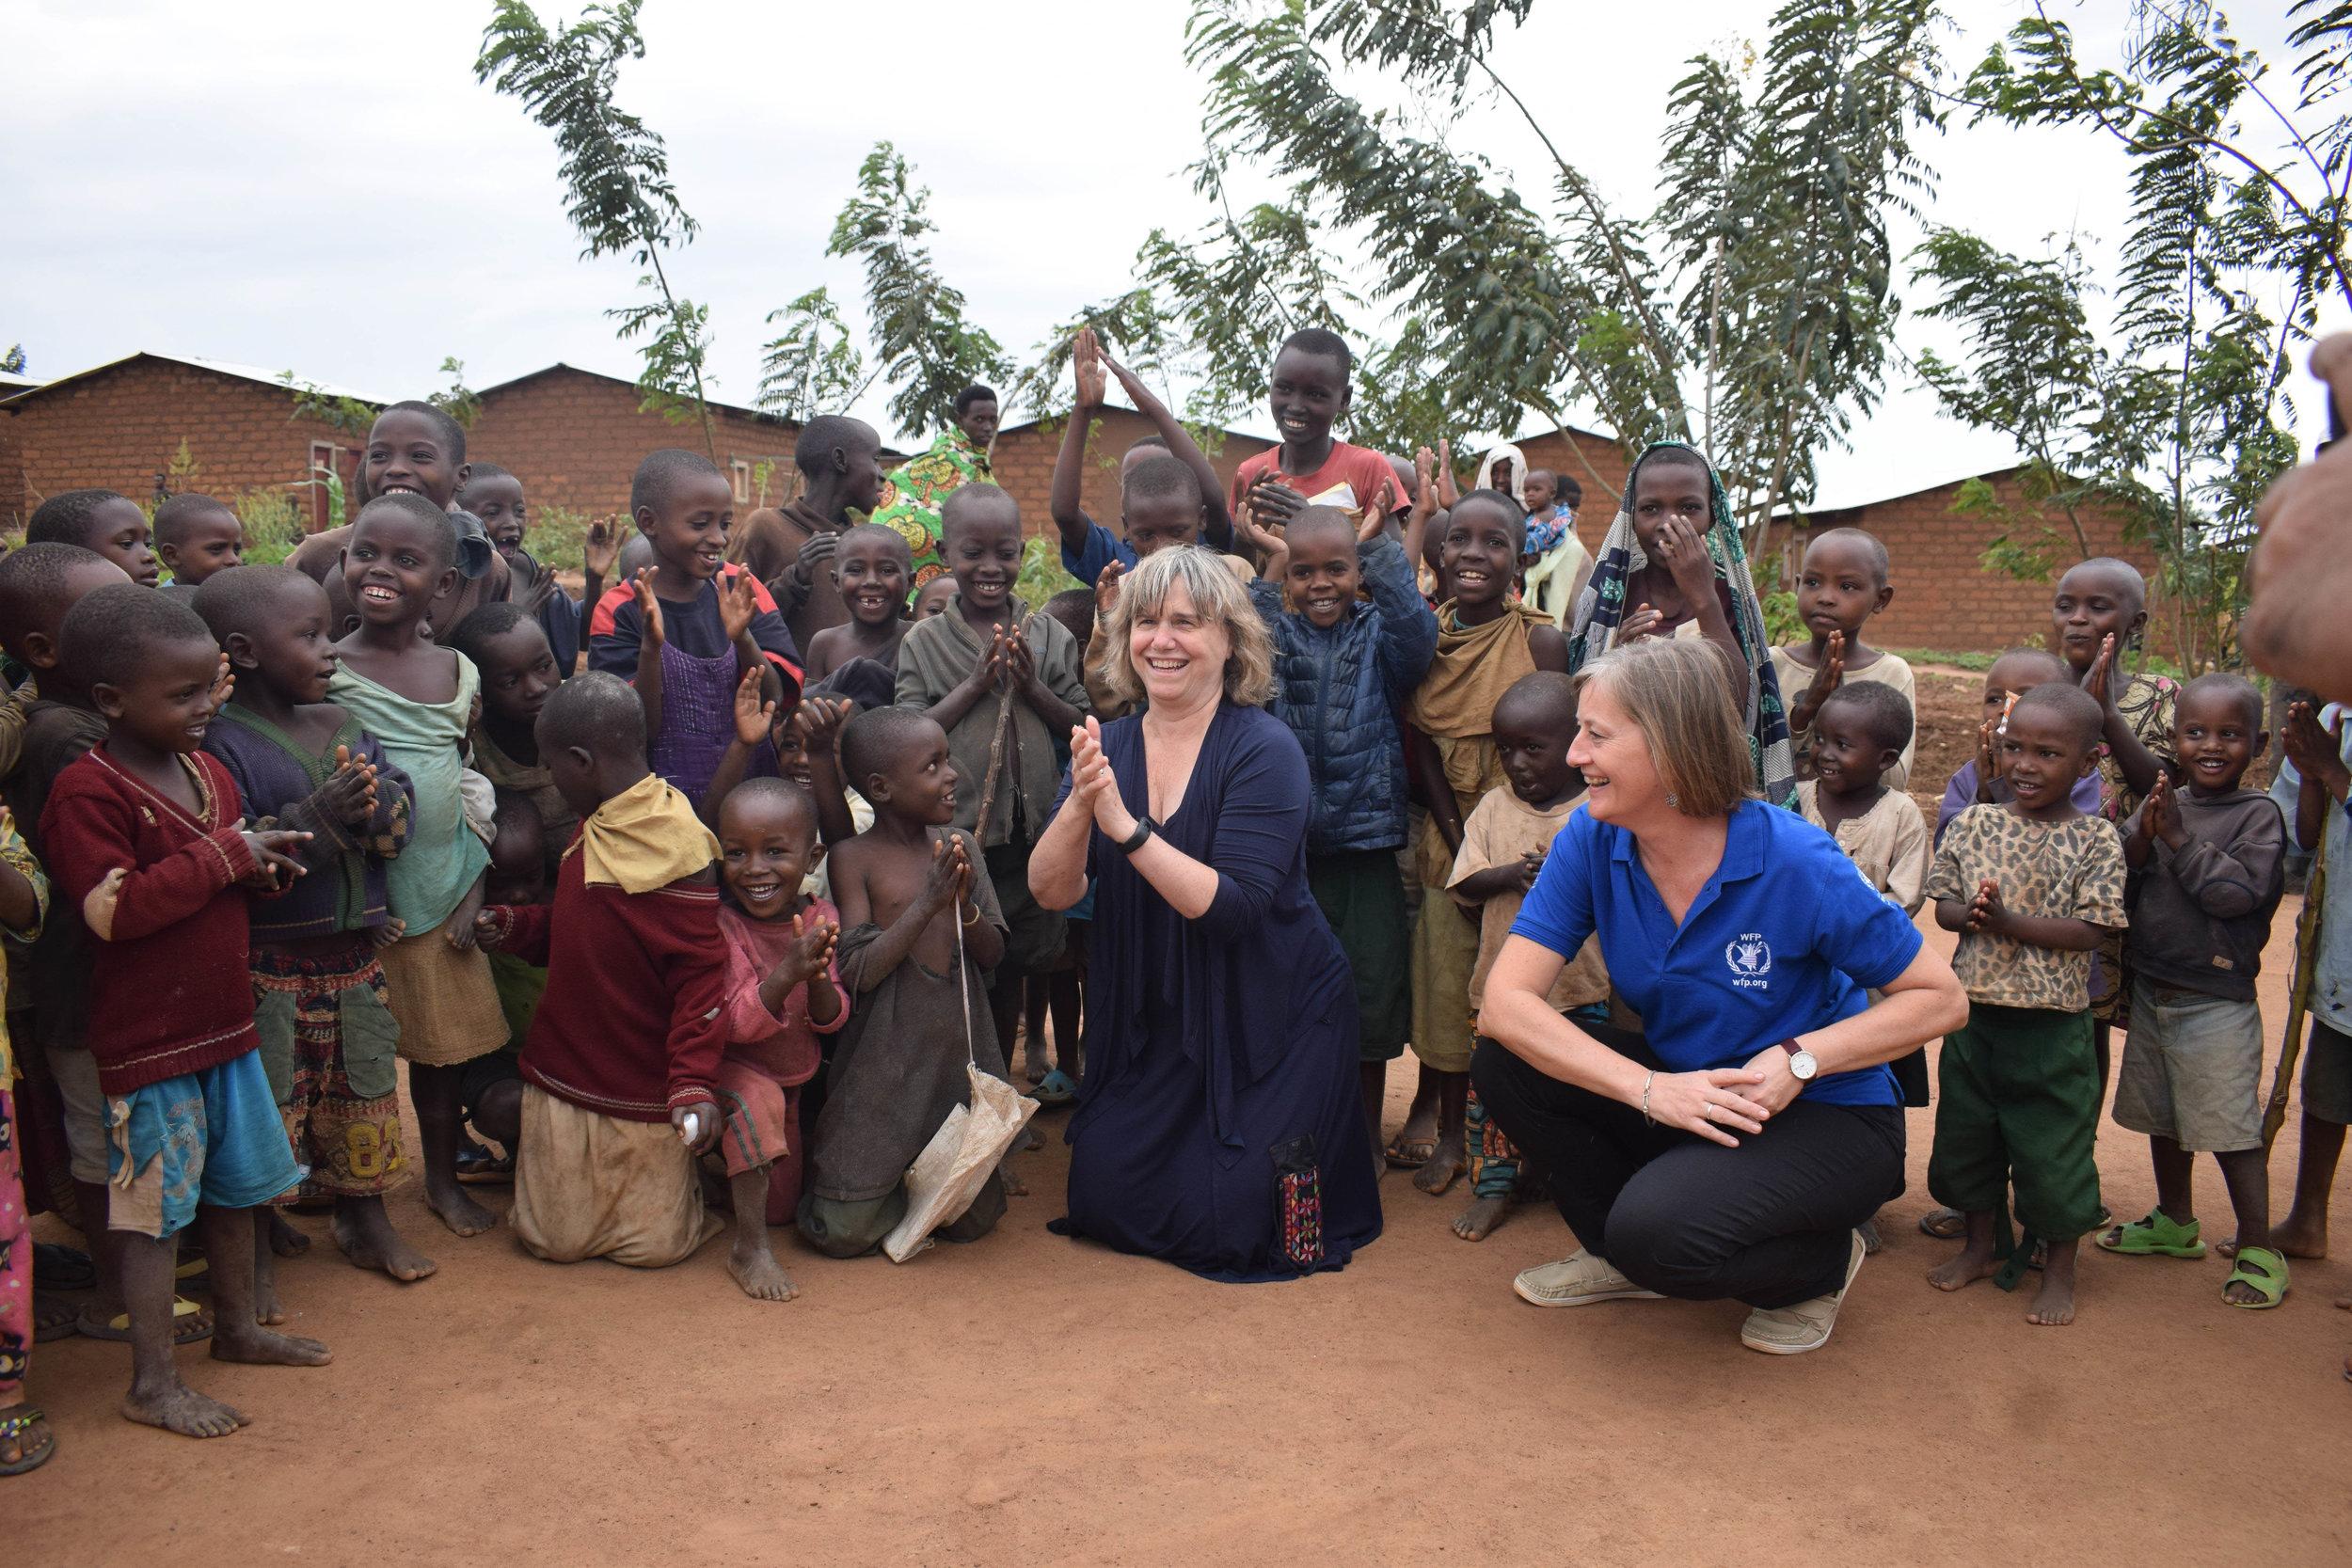 Mahama Refugee Camp, Rwanda with Edith Heines, WFP Country Director 2018 – Photo by Bosco Muyinda